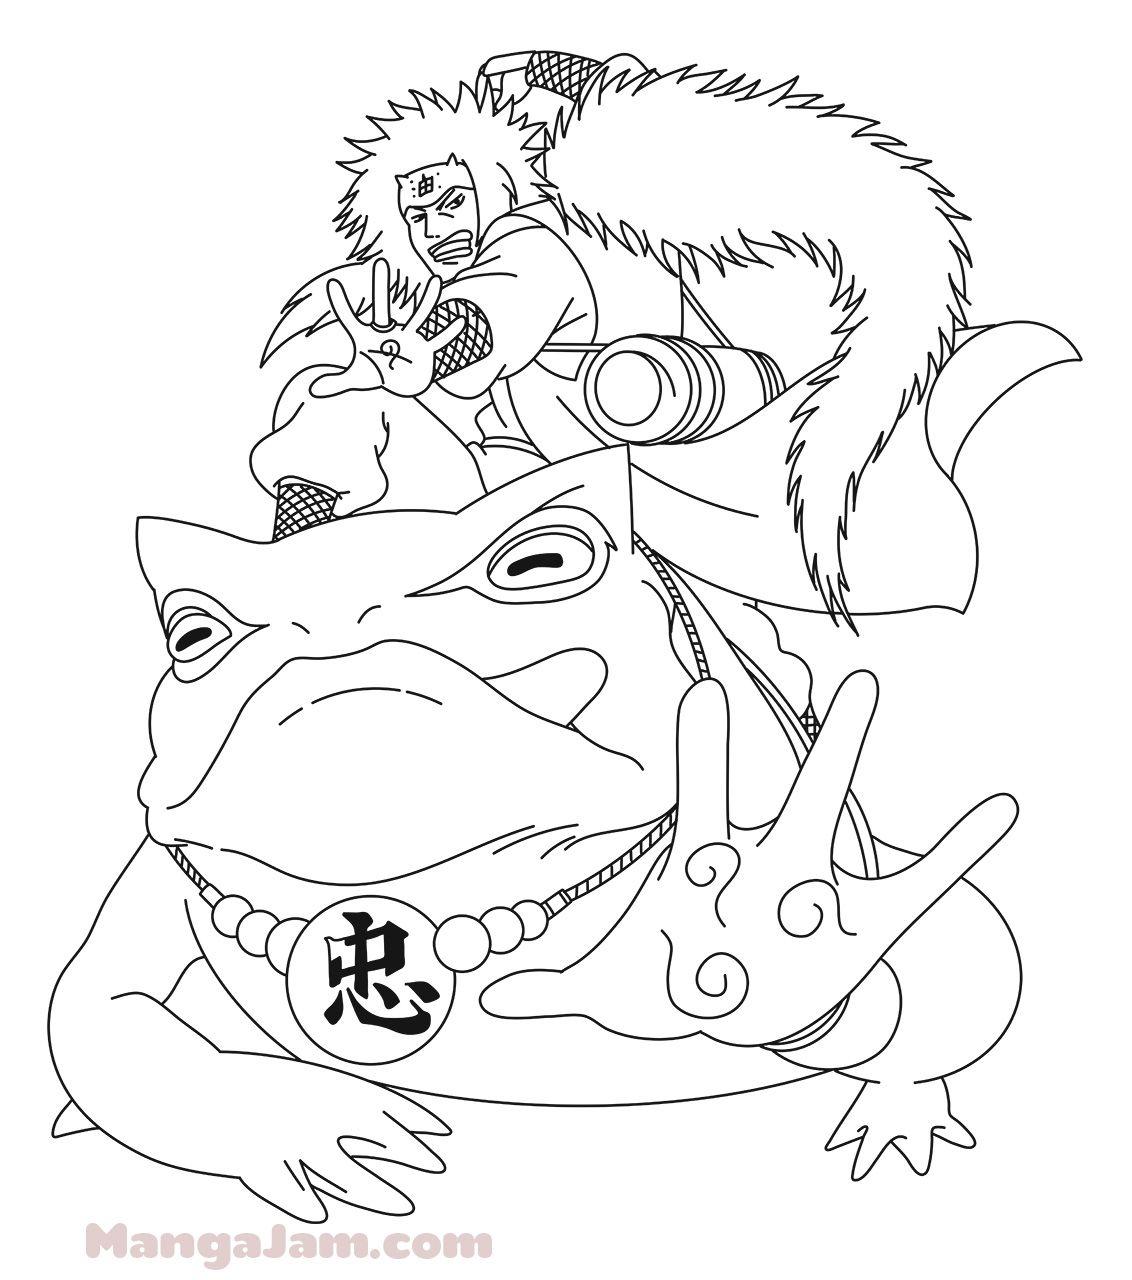 How To Draw Gamabunta With Jiraya From Naruto | Jiraya Naruto concernant Coloriage De Naruto Shippuden A Imprimer